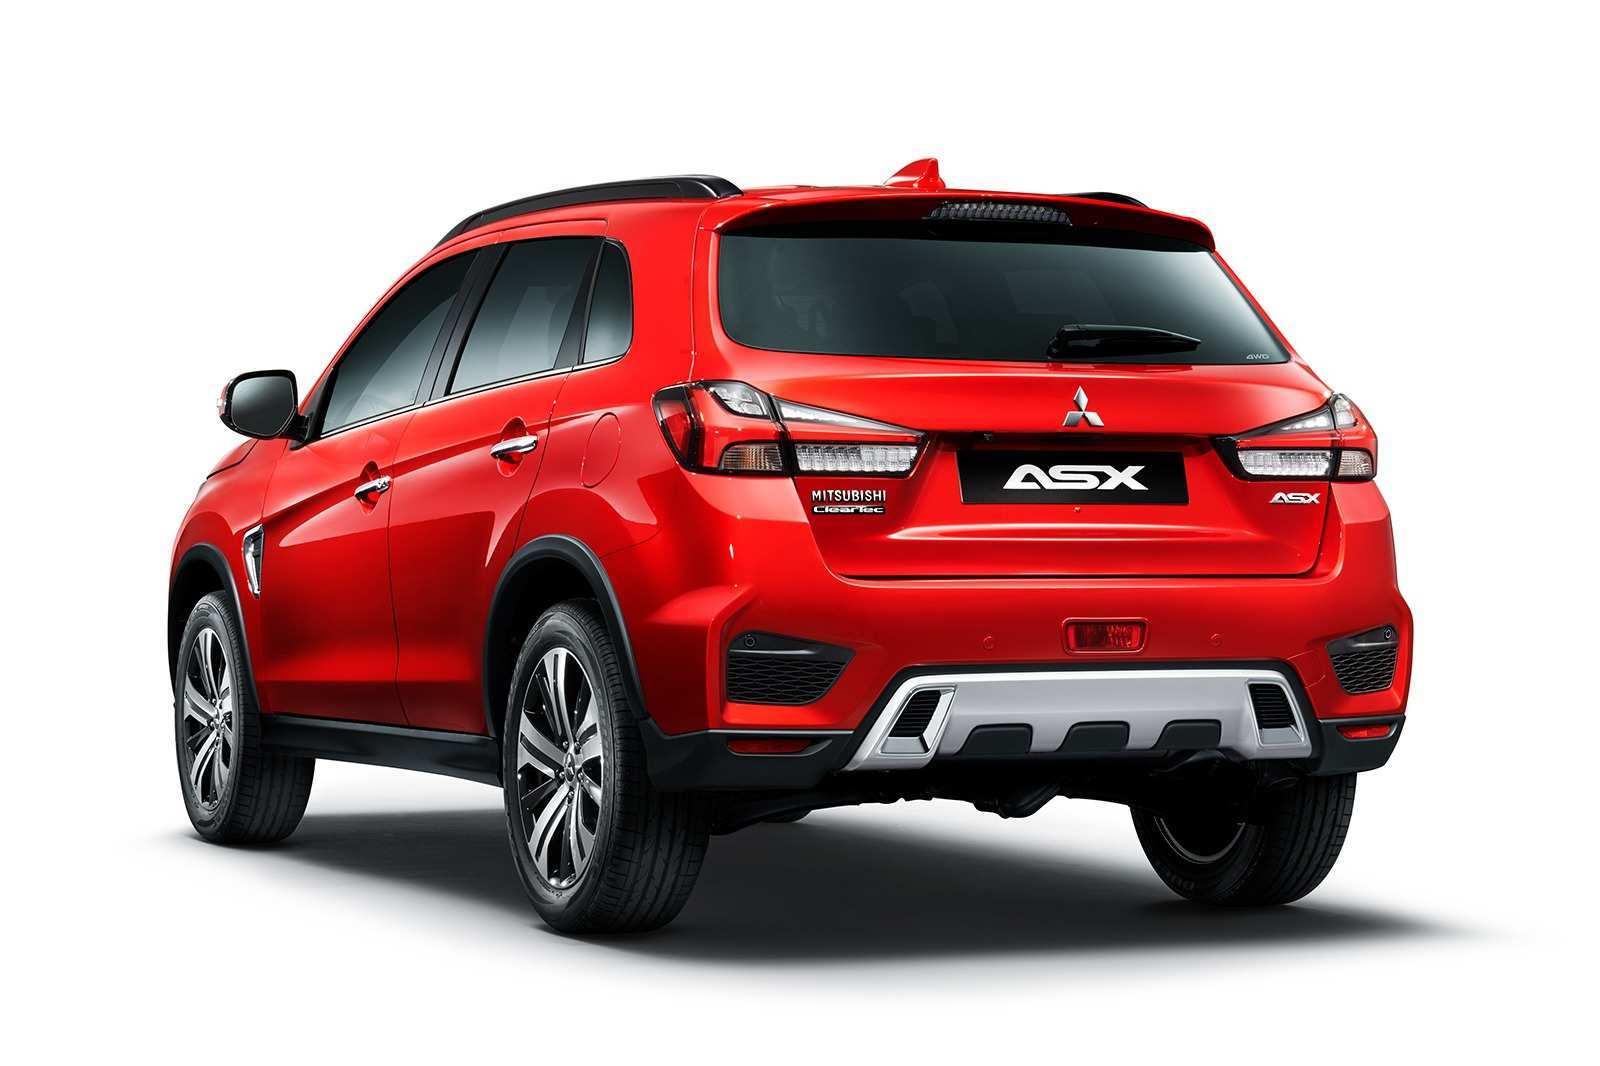 98 The Mitsubishi Asx 2020 Dimensions Model with Mitsubishi Asx 2020 Dimensions